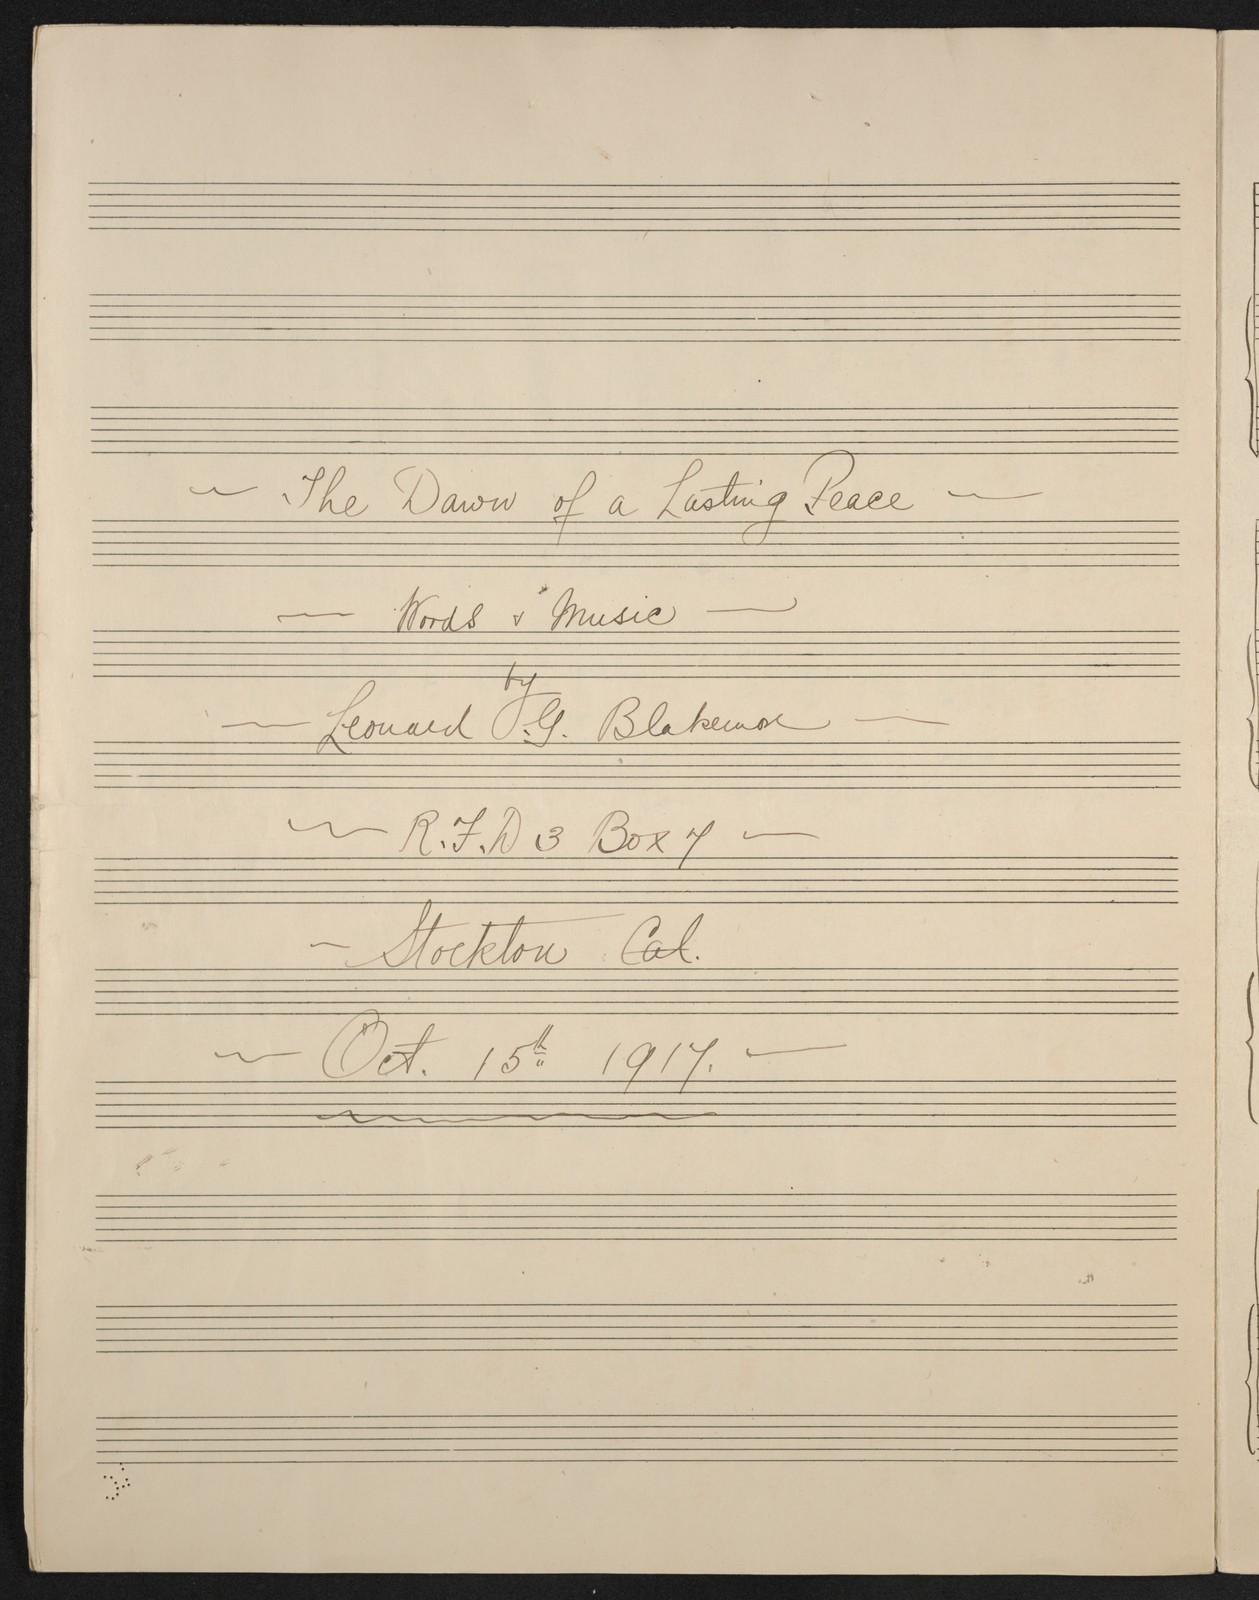 The  ballad of Hiram J. O'Swatter of Punkin, Oklahoma